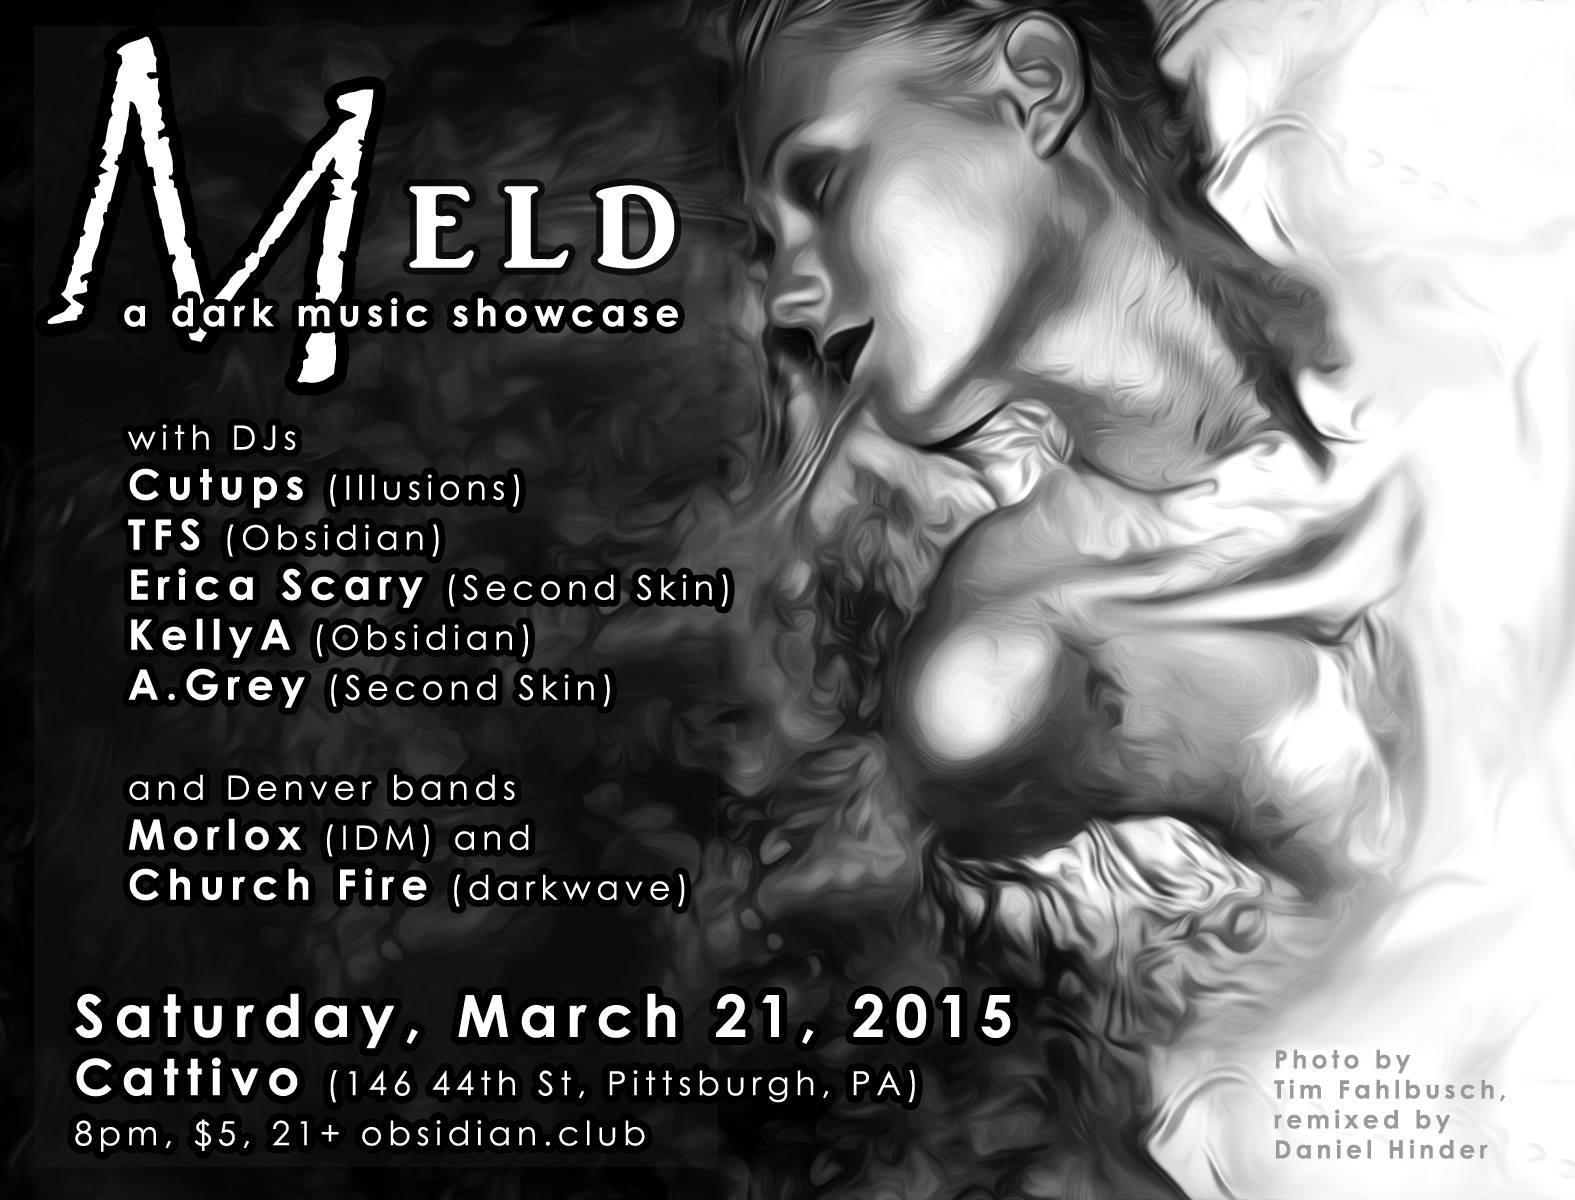 Sat Mar 21st MELD dark music showcase w/ Church Fire & Morlox (live), + djs A. Grey, Cutups, Kelly A, Erica Scary & TFS @ Cattivo